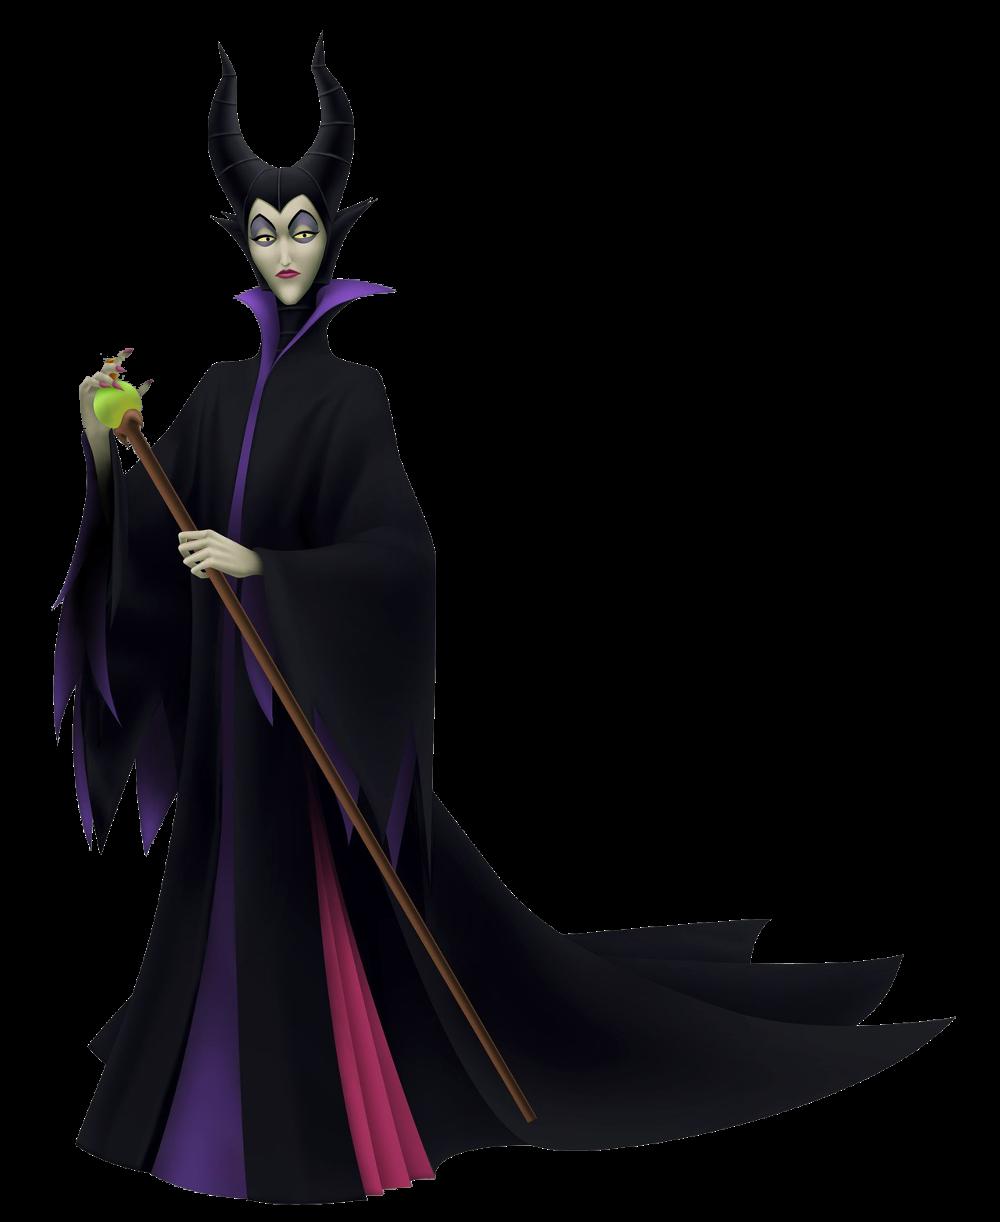 Image Maleficent Png Disney Wiki Fandom Powered By Wikia